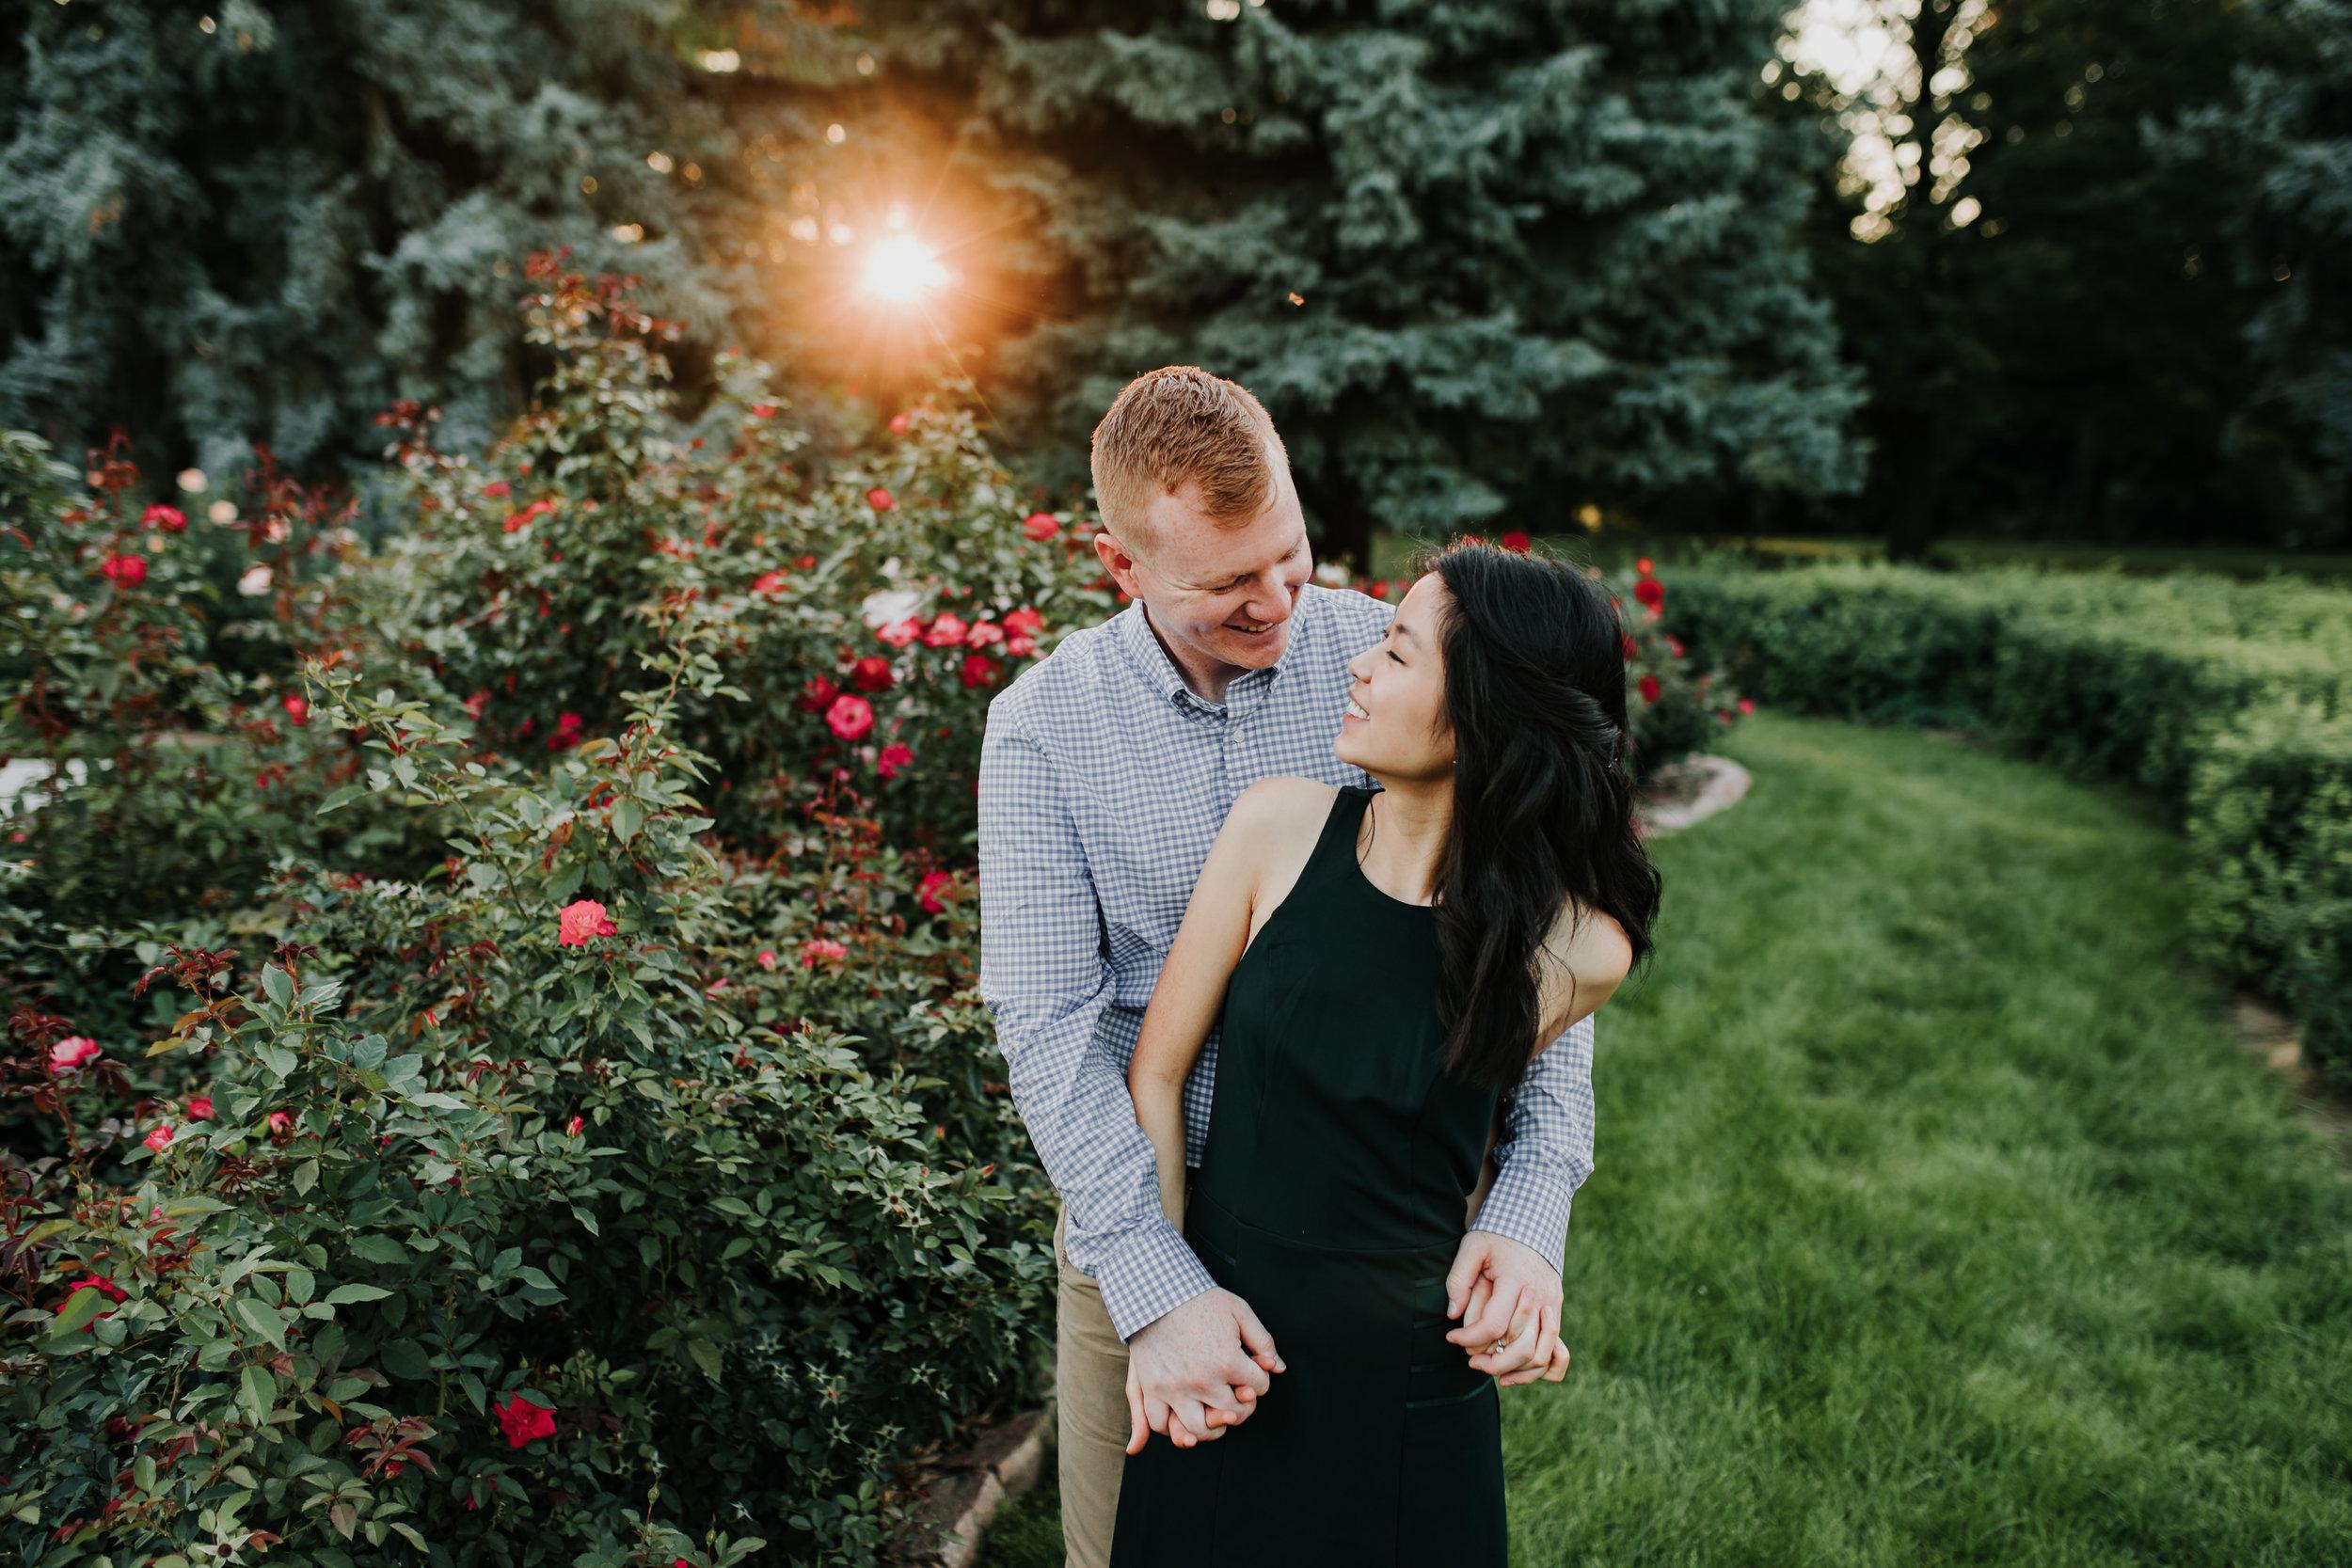 Catherin & Kyle - Married - Nathaniel Jensen Photography - Omaha Nebraska Wedding Photograper - Memorial Park - Joslyn Castle Engagement Session-58.jpg